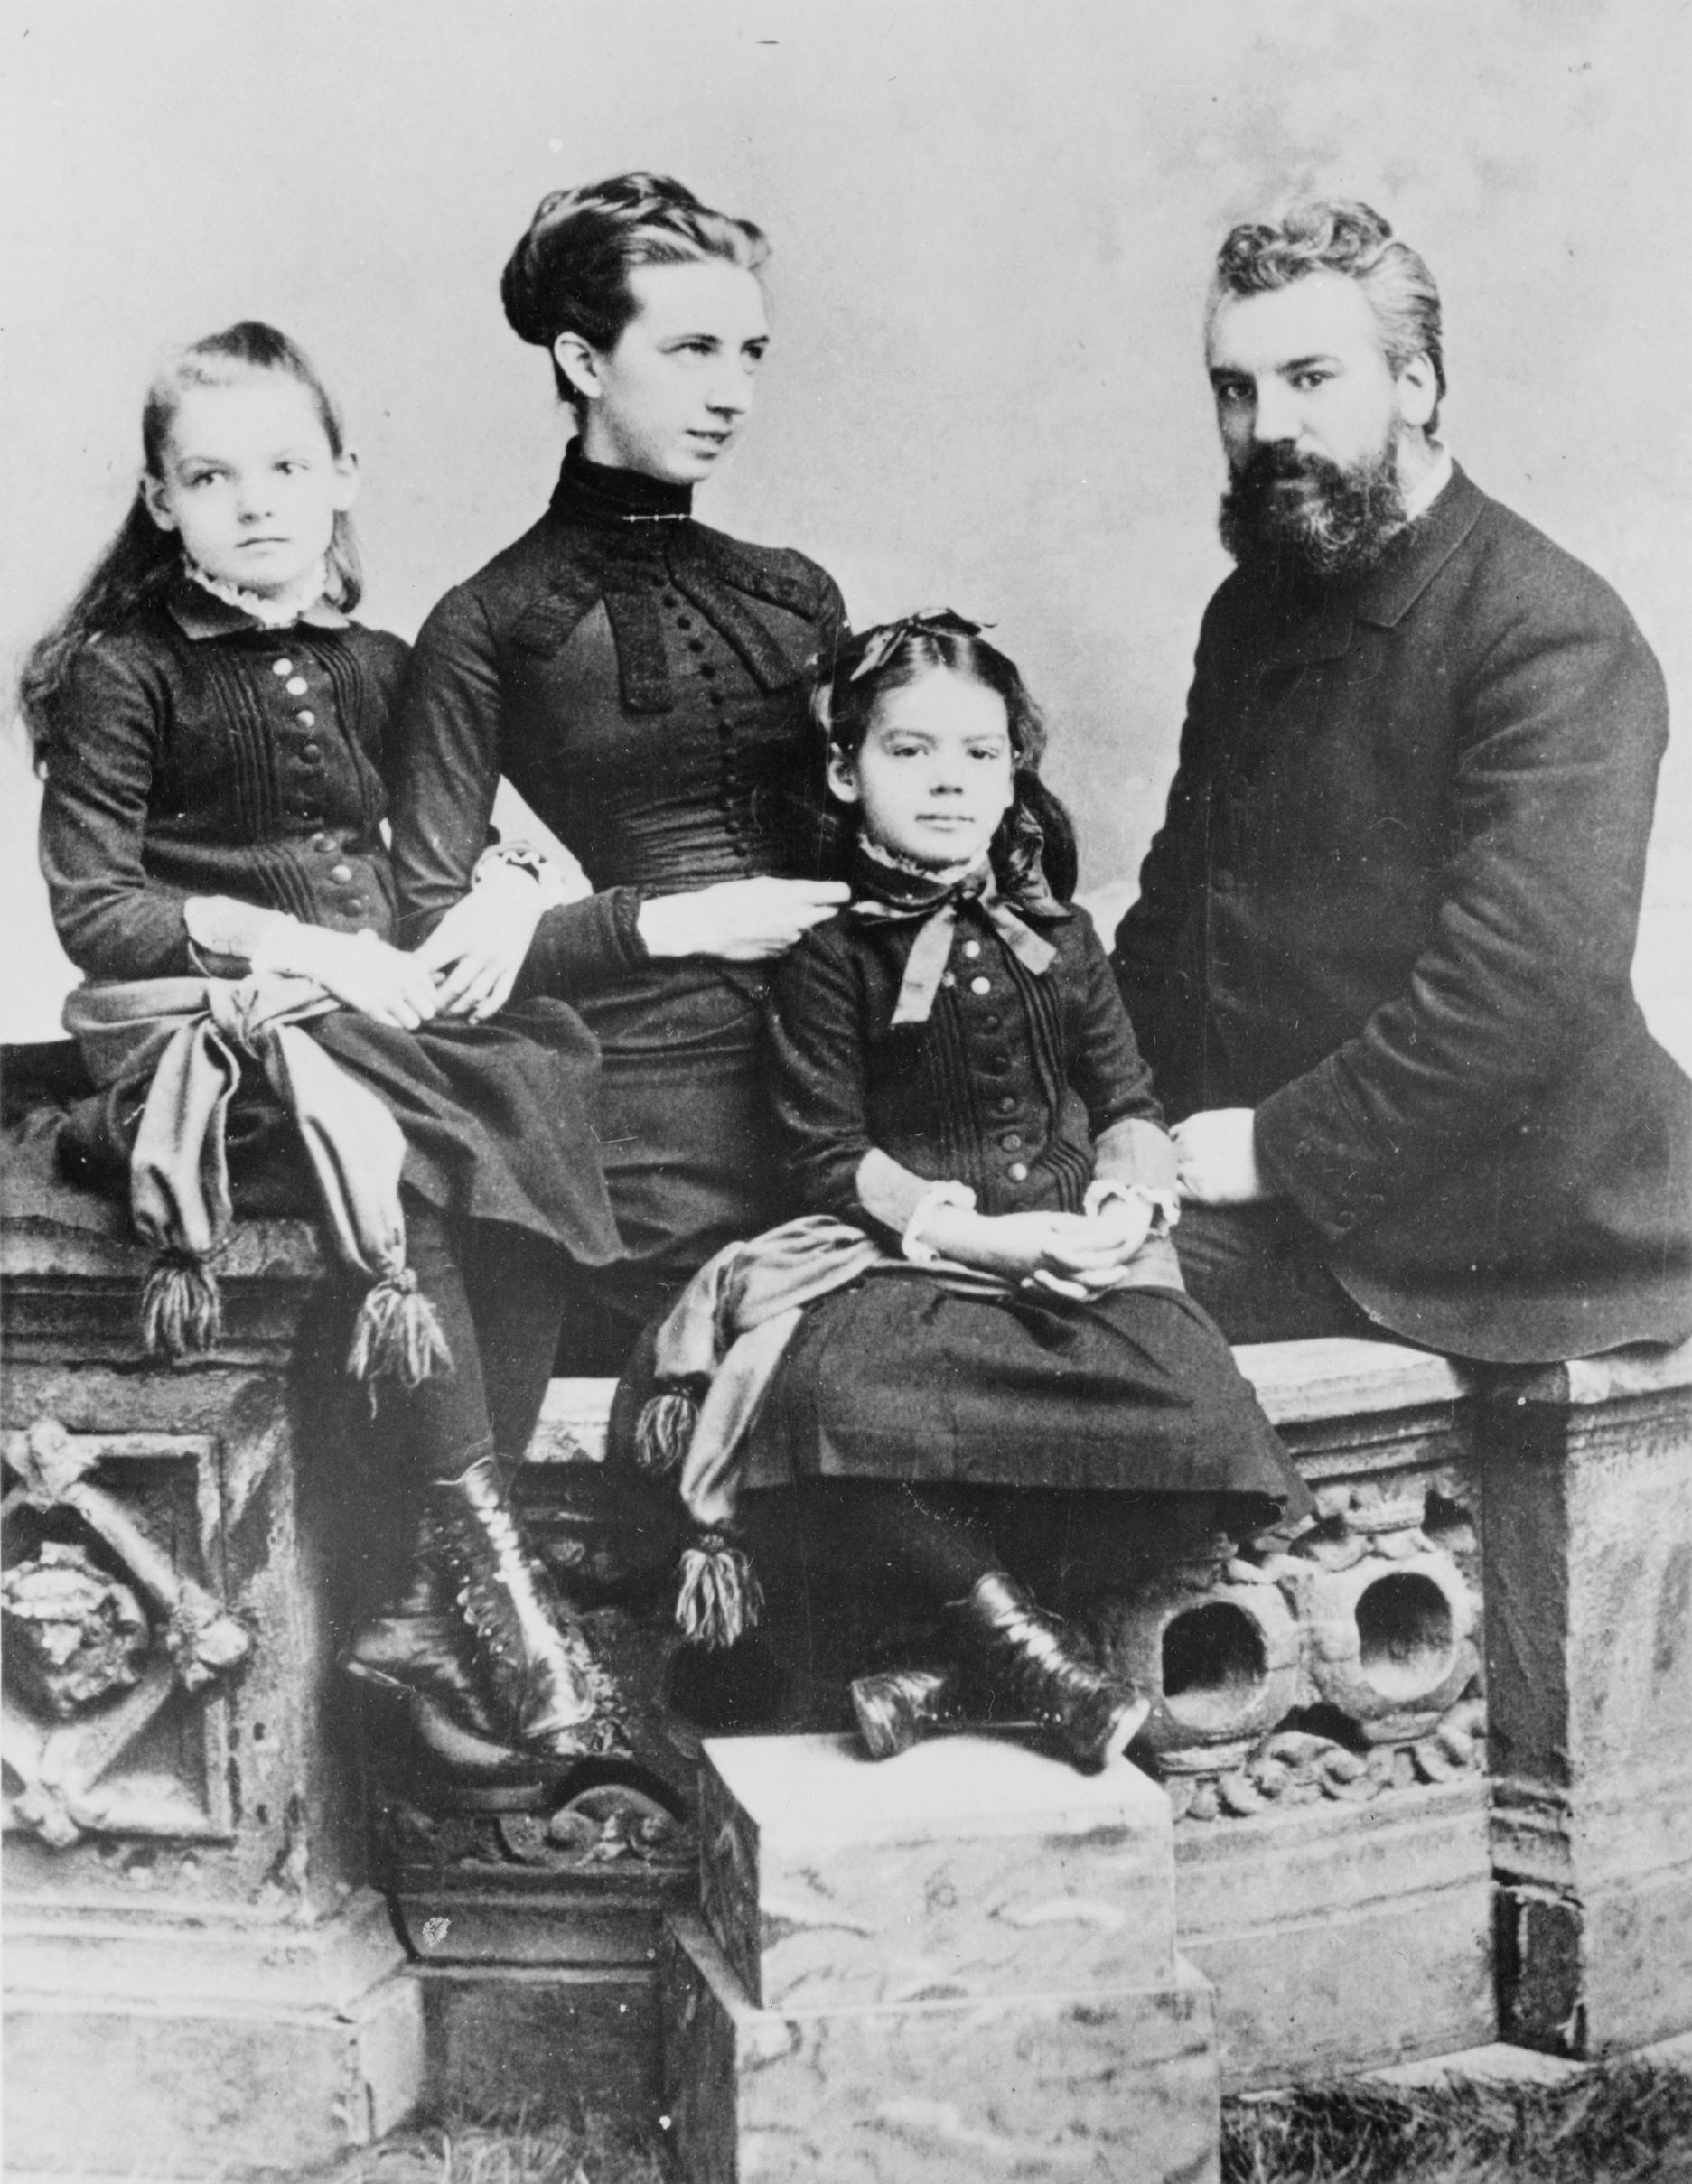 Description alexander graham bell and family